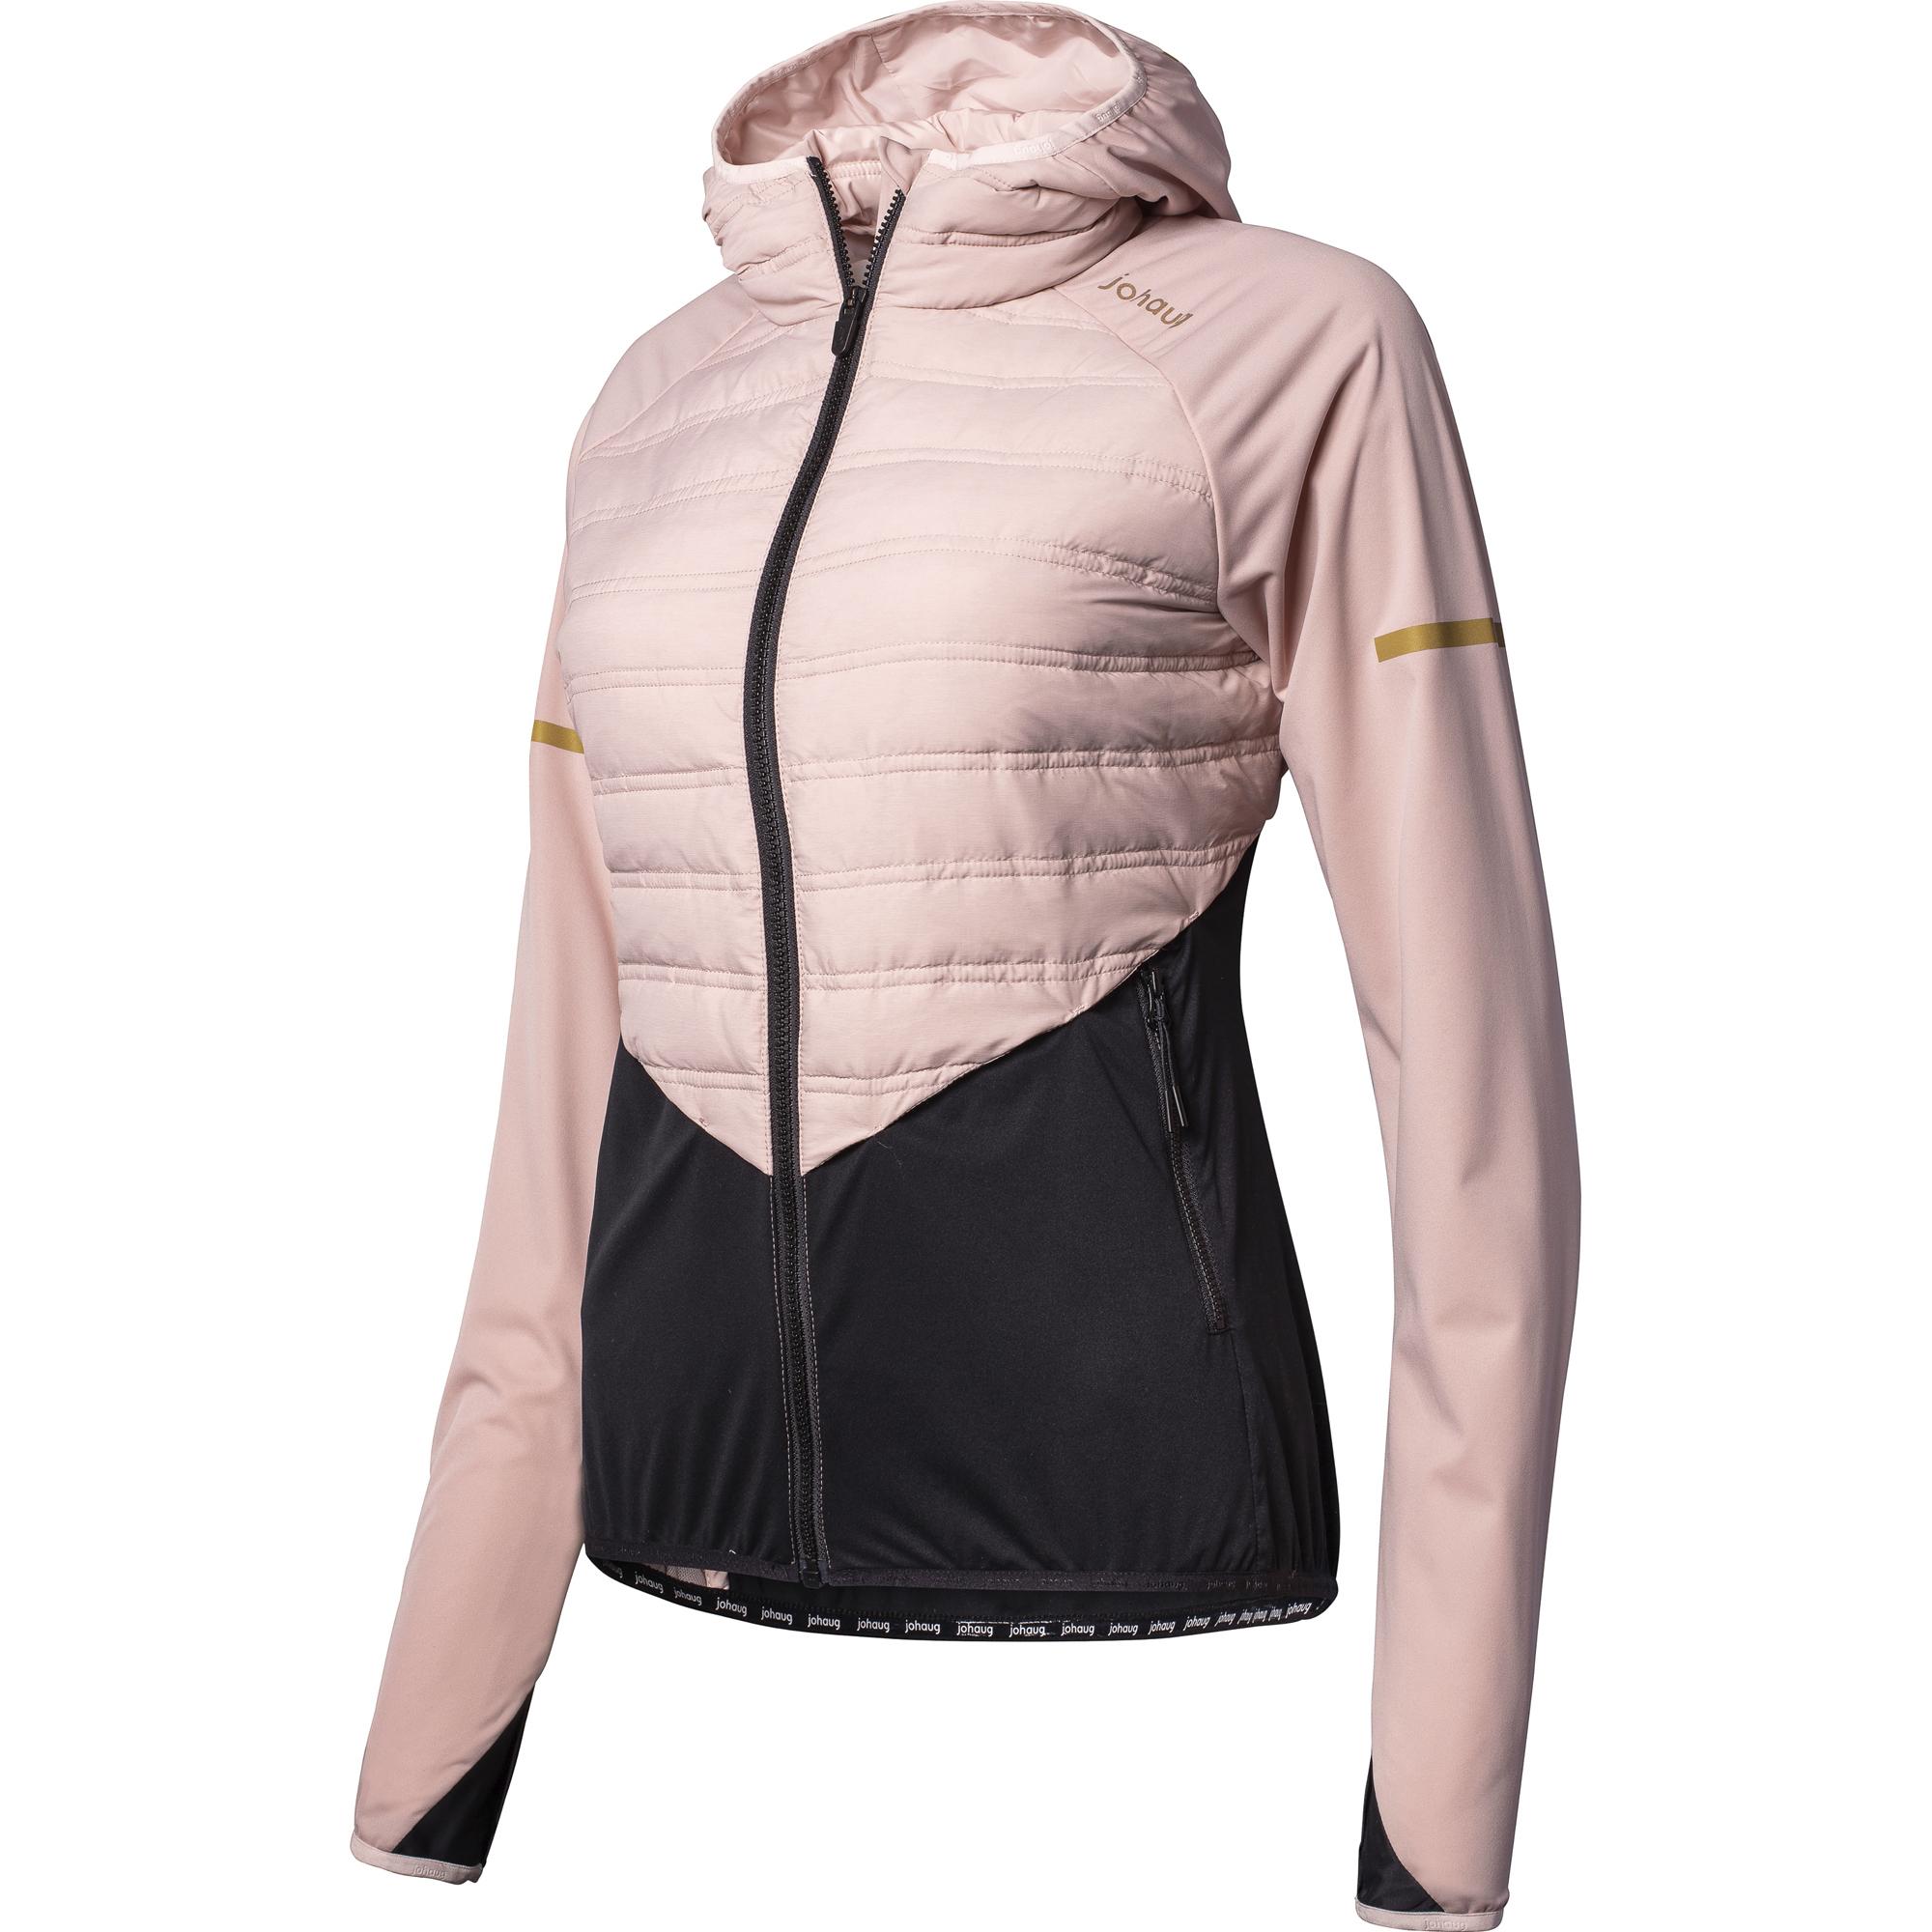 Johaug Concept Jacket bgree